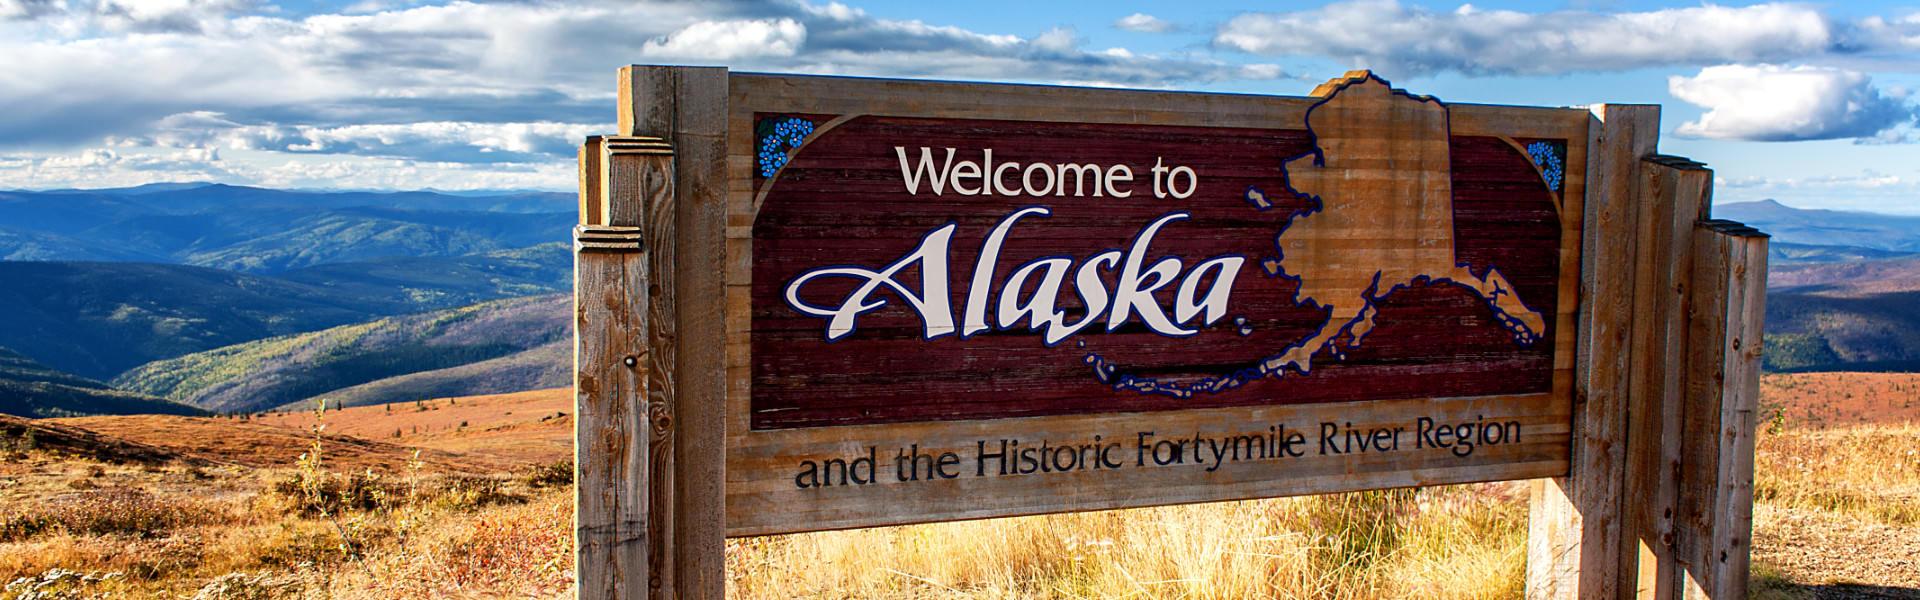 Mietwagenreisen USA - Alaska